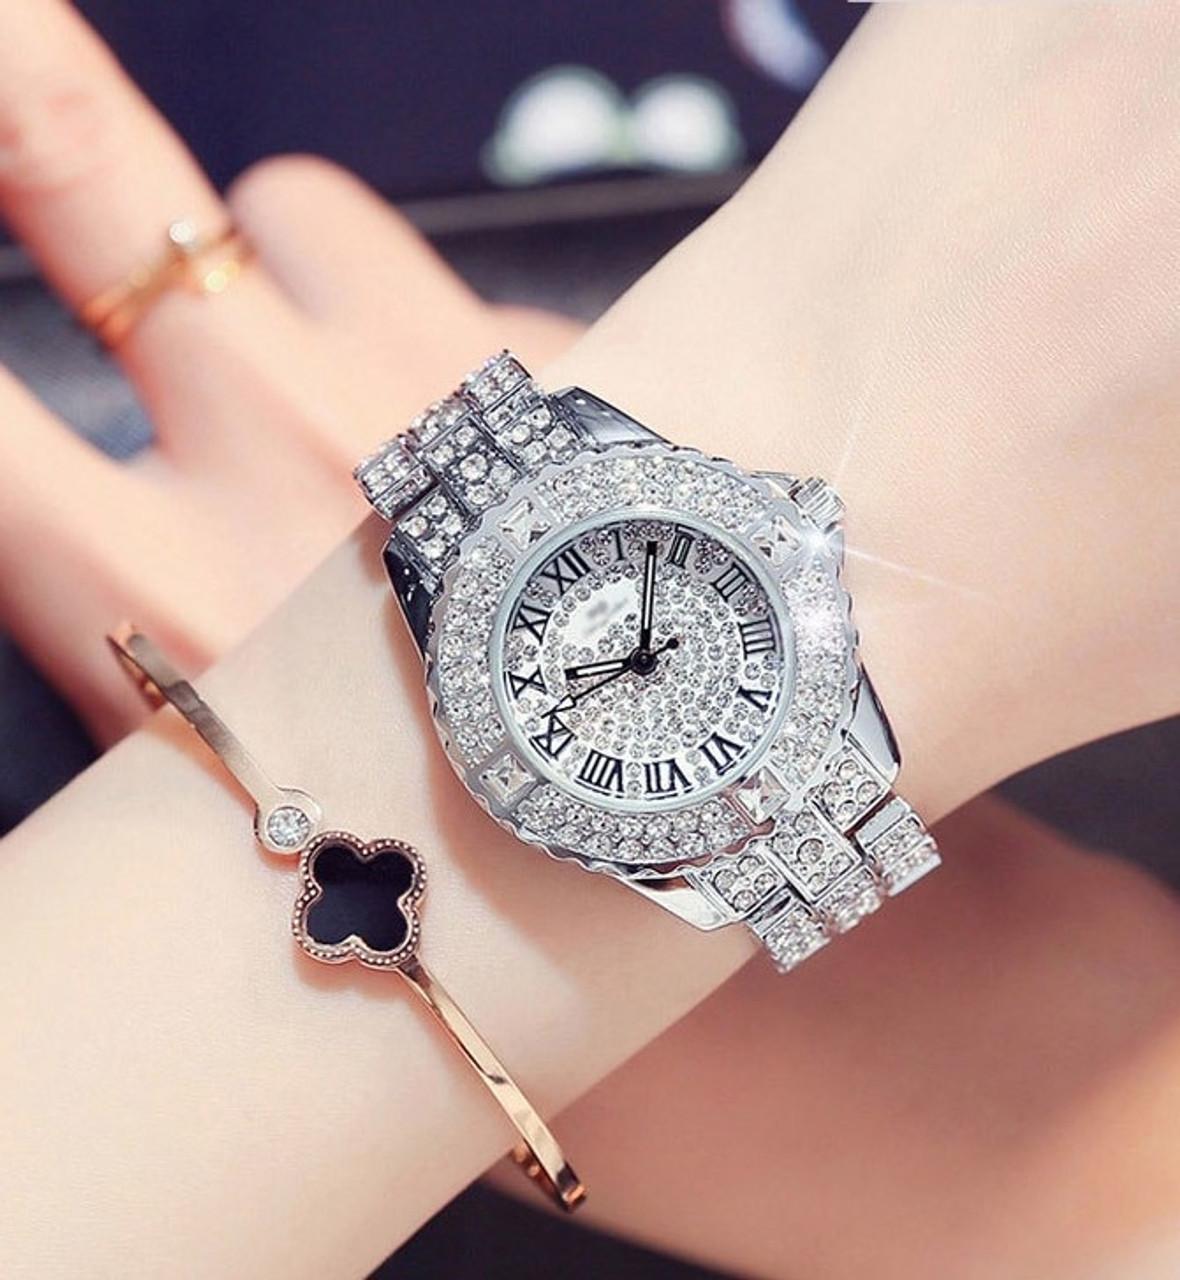 ... New Luxury Rhinestone Bracelet Watch Women Diamond Fashion Ladies Dress  Watch Brand Stainless Steel Crystal Wristwatch ... 5961230a6ea3